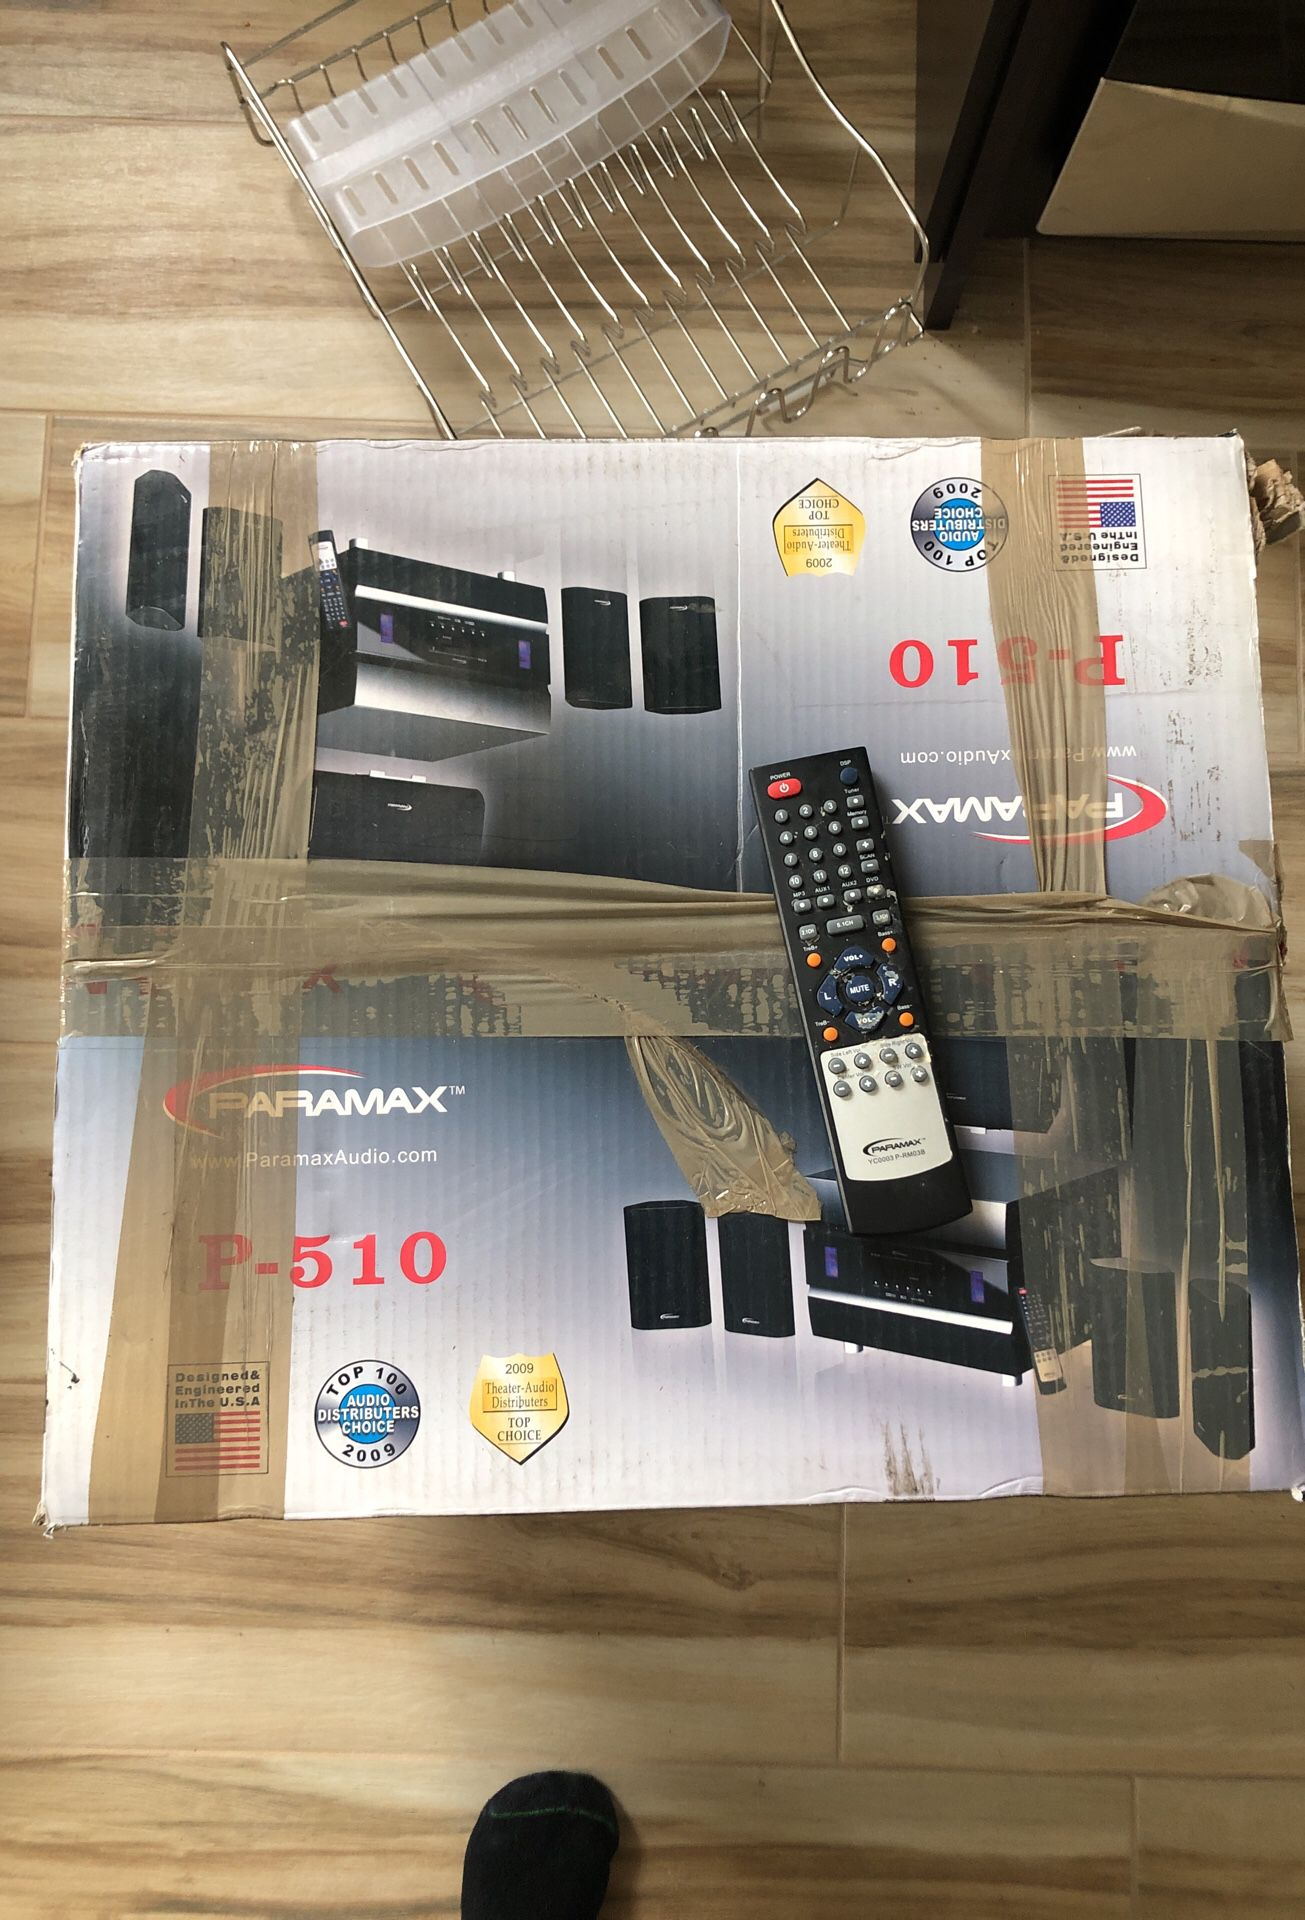 Paramax P510 surround system